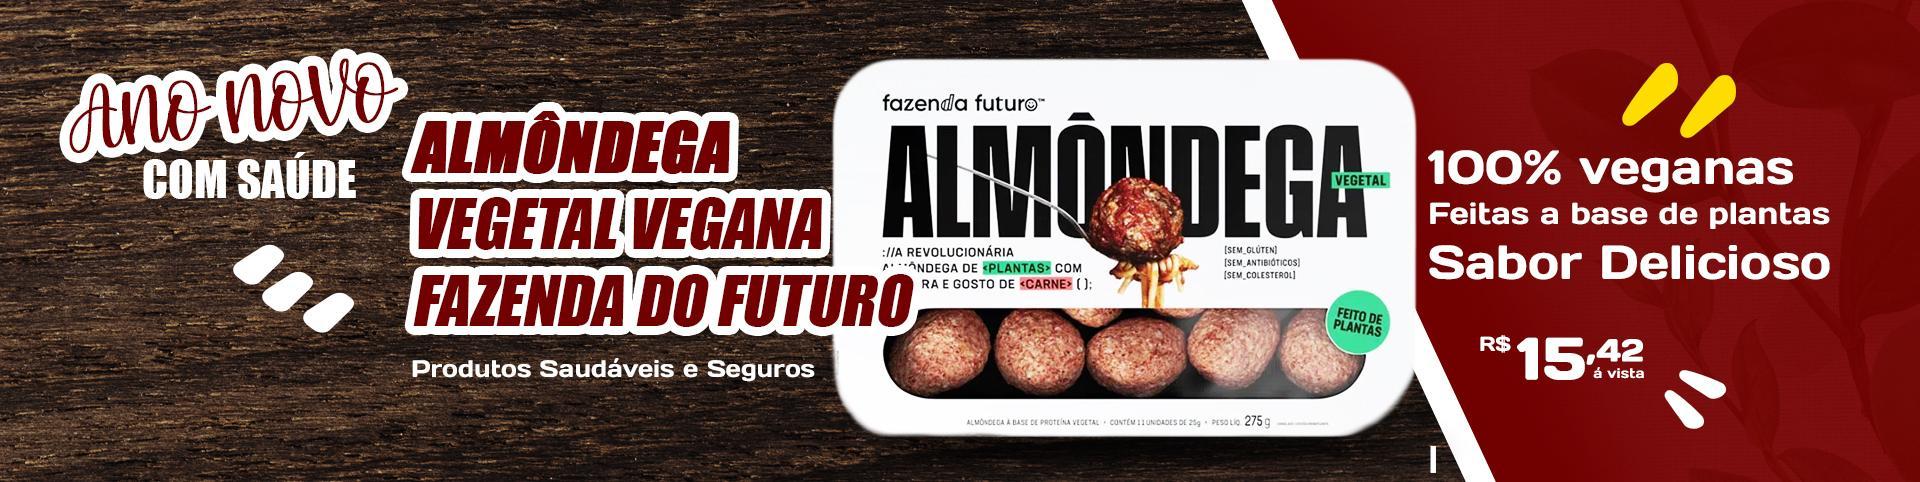 Almondega vegetal vegana a base de plantas Fazenda do Futuro